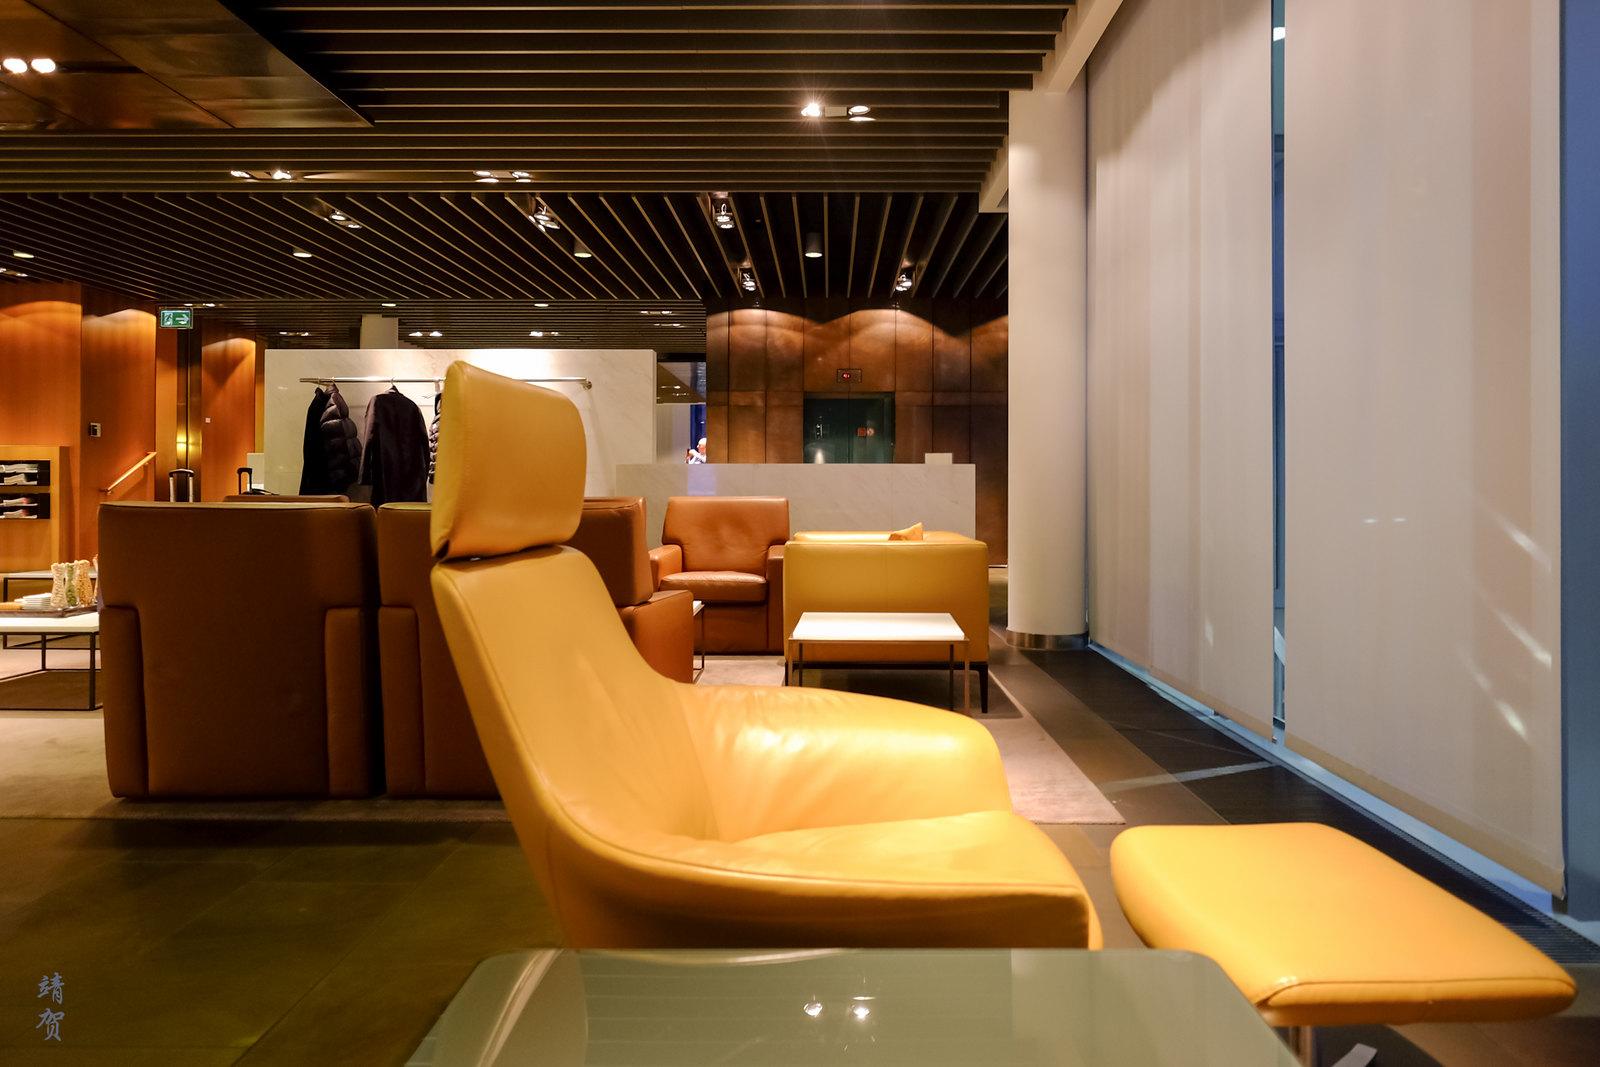 Lounge chairs facing the windows